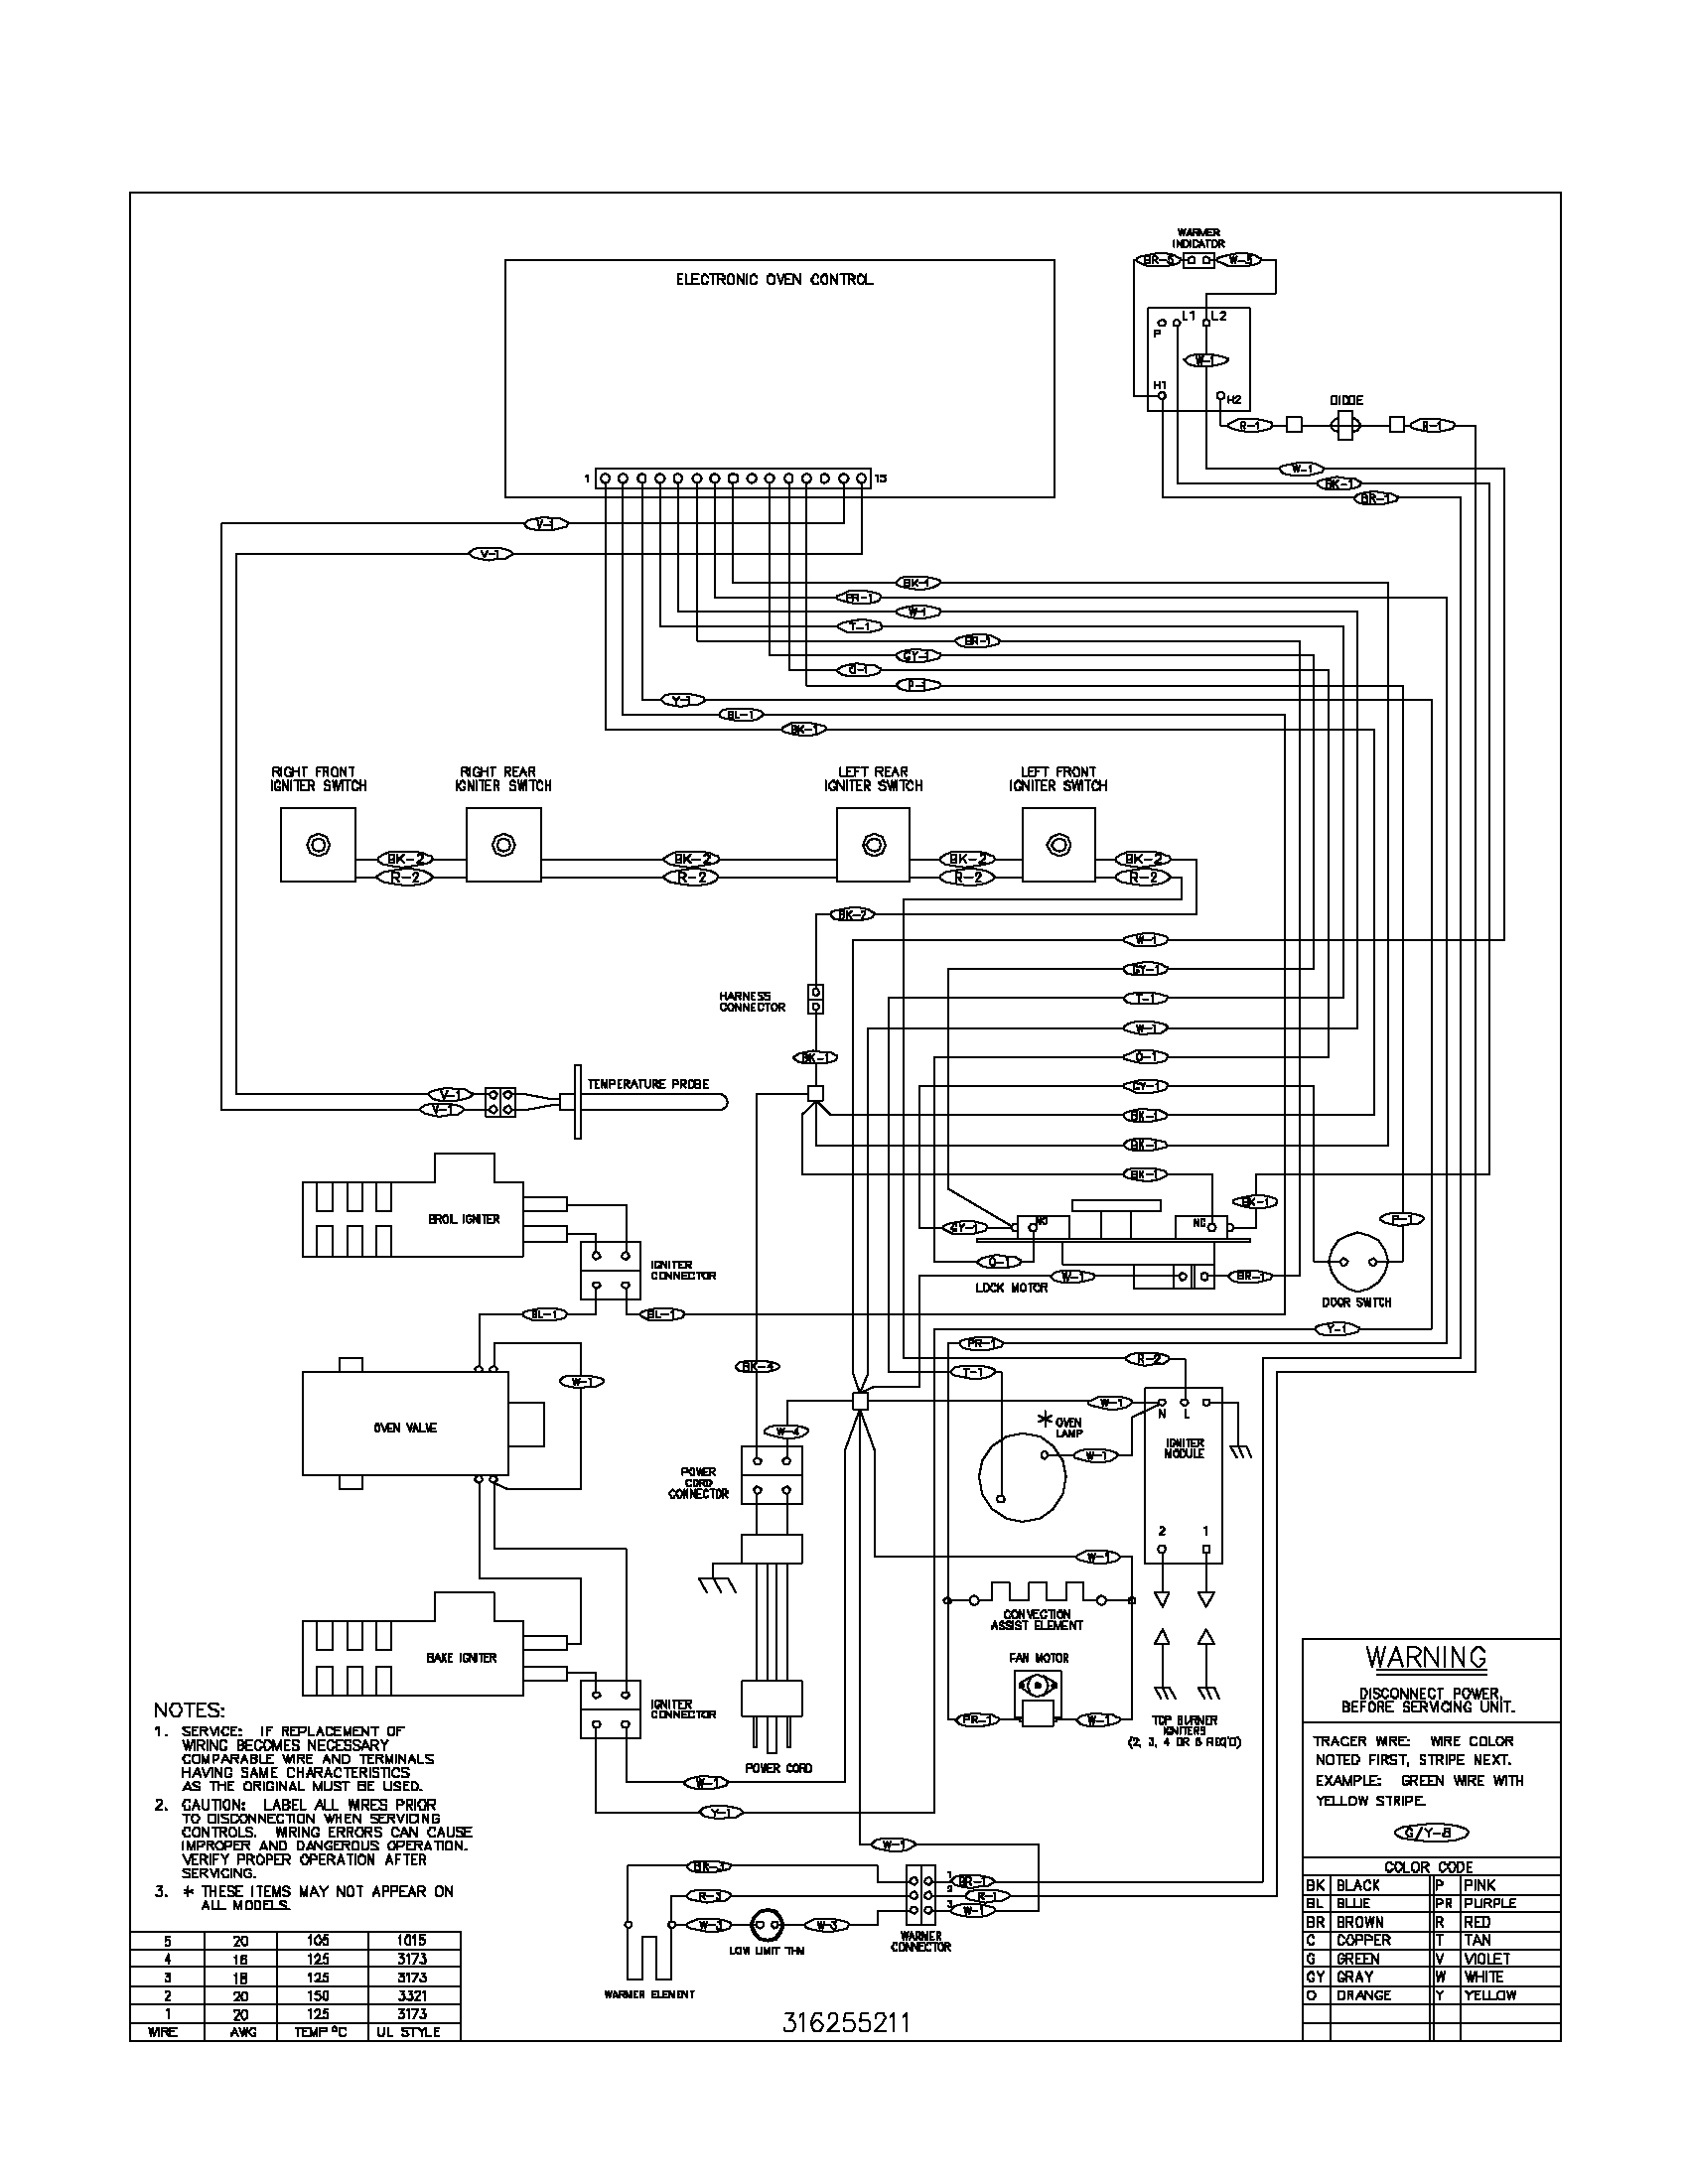 Wiring diagram parts?resize=1700%2C2200 frigidaire gler341as2 dryer wiring diagram frigidaire dryer coil on dryer gibson diagram wiring gef331as2